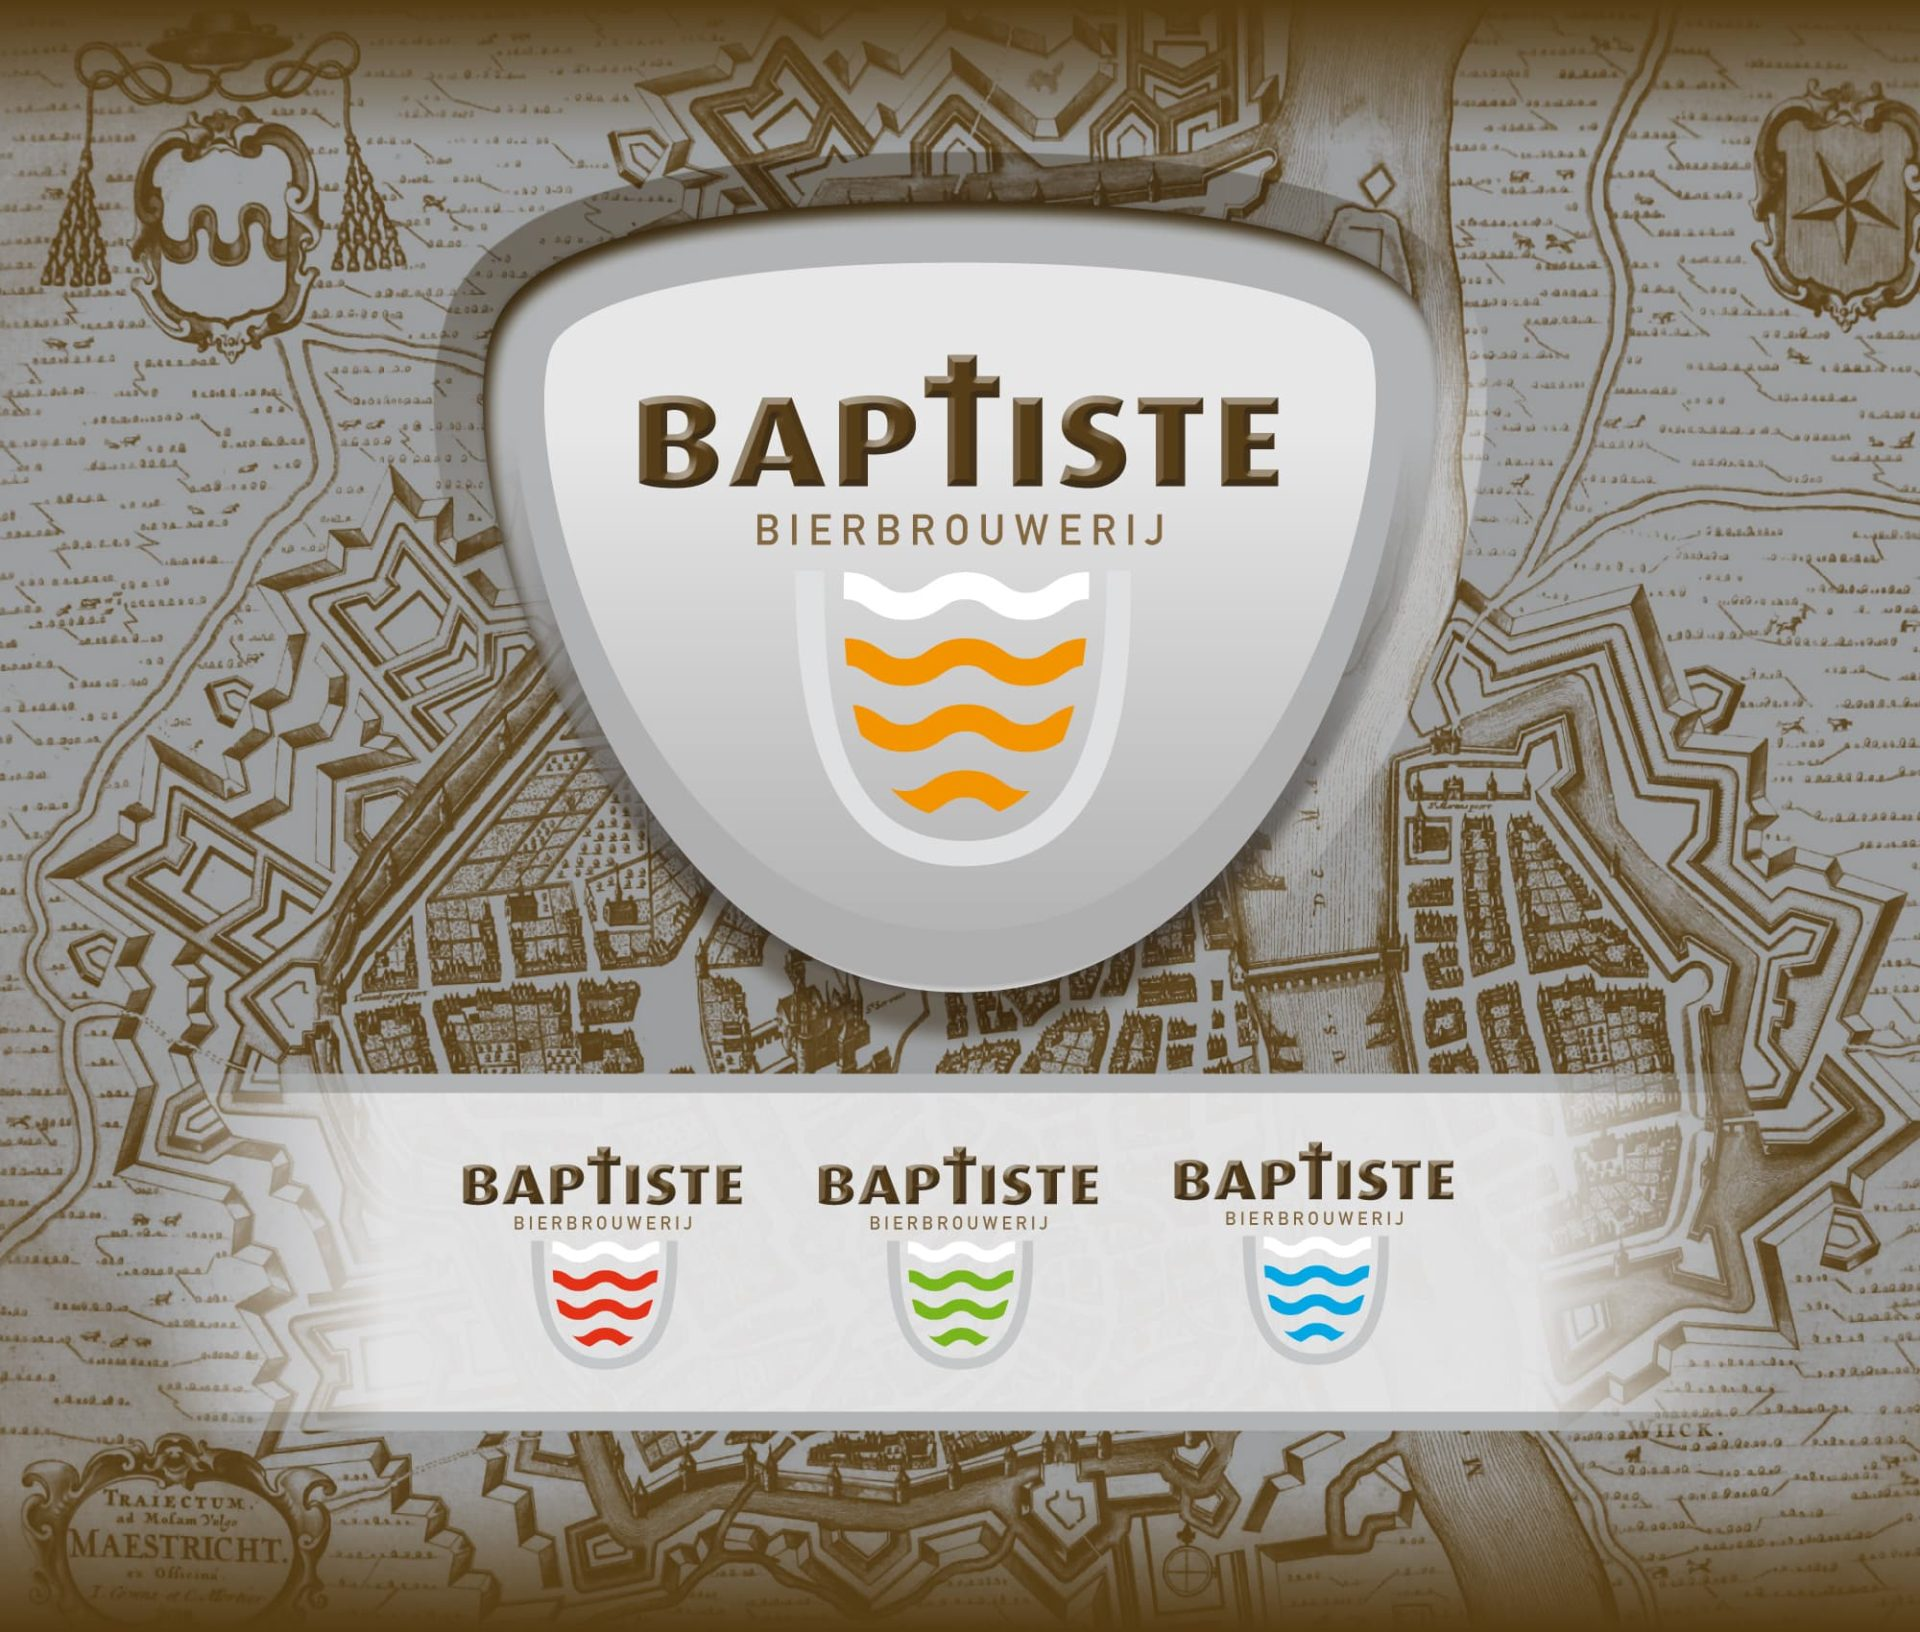 Baptiste logo - Jeroen Borrenbergs)